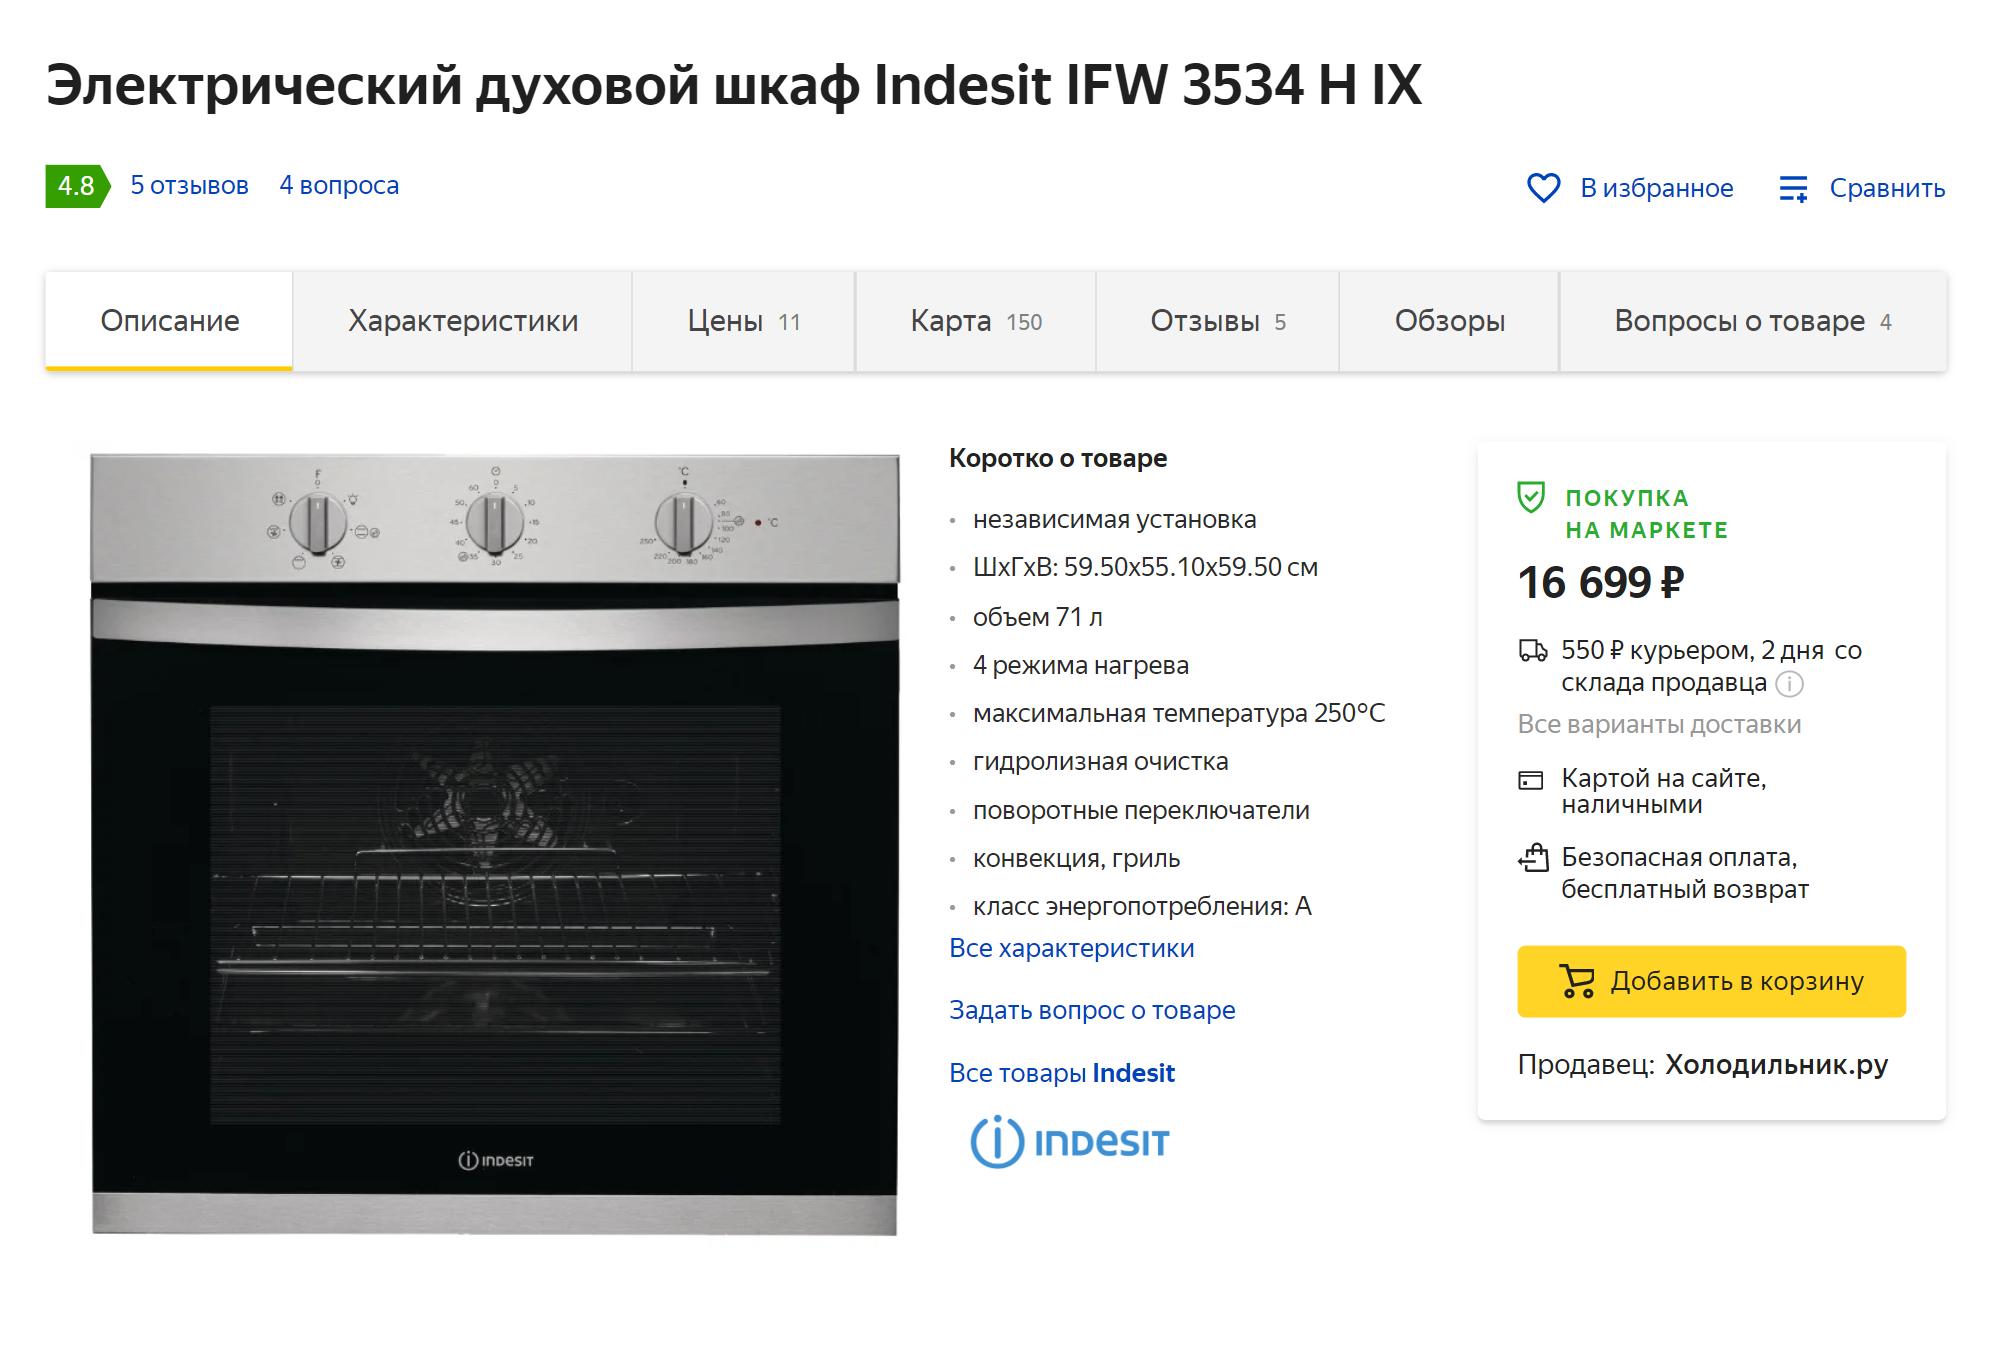 Так же и с духовым шкафом: в&nbsp;«Едим дома» за&nbsp;него запросили 18&nbsp;861&nbsp;<span class=ruble>Р</span>, а&nbsp;на&nbsp;«Яндекс-маркете» такой стоит 16&nbsp;440&nbsp;<span class=ruble>Р</span>